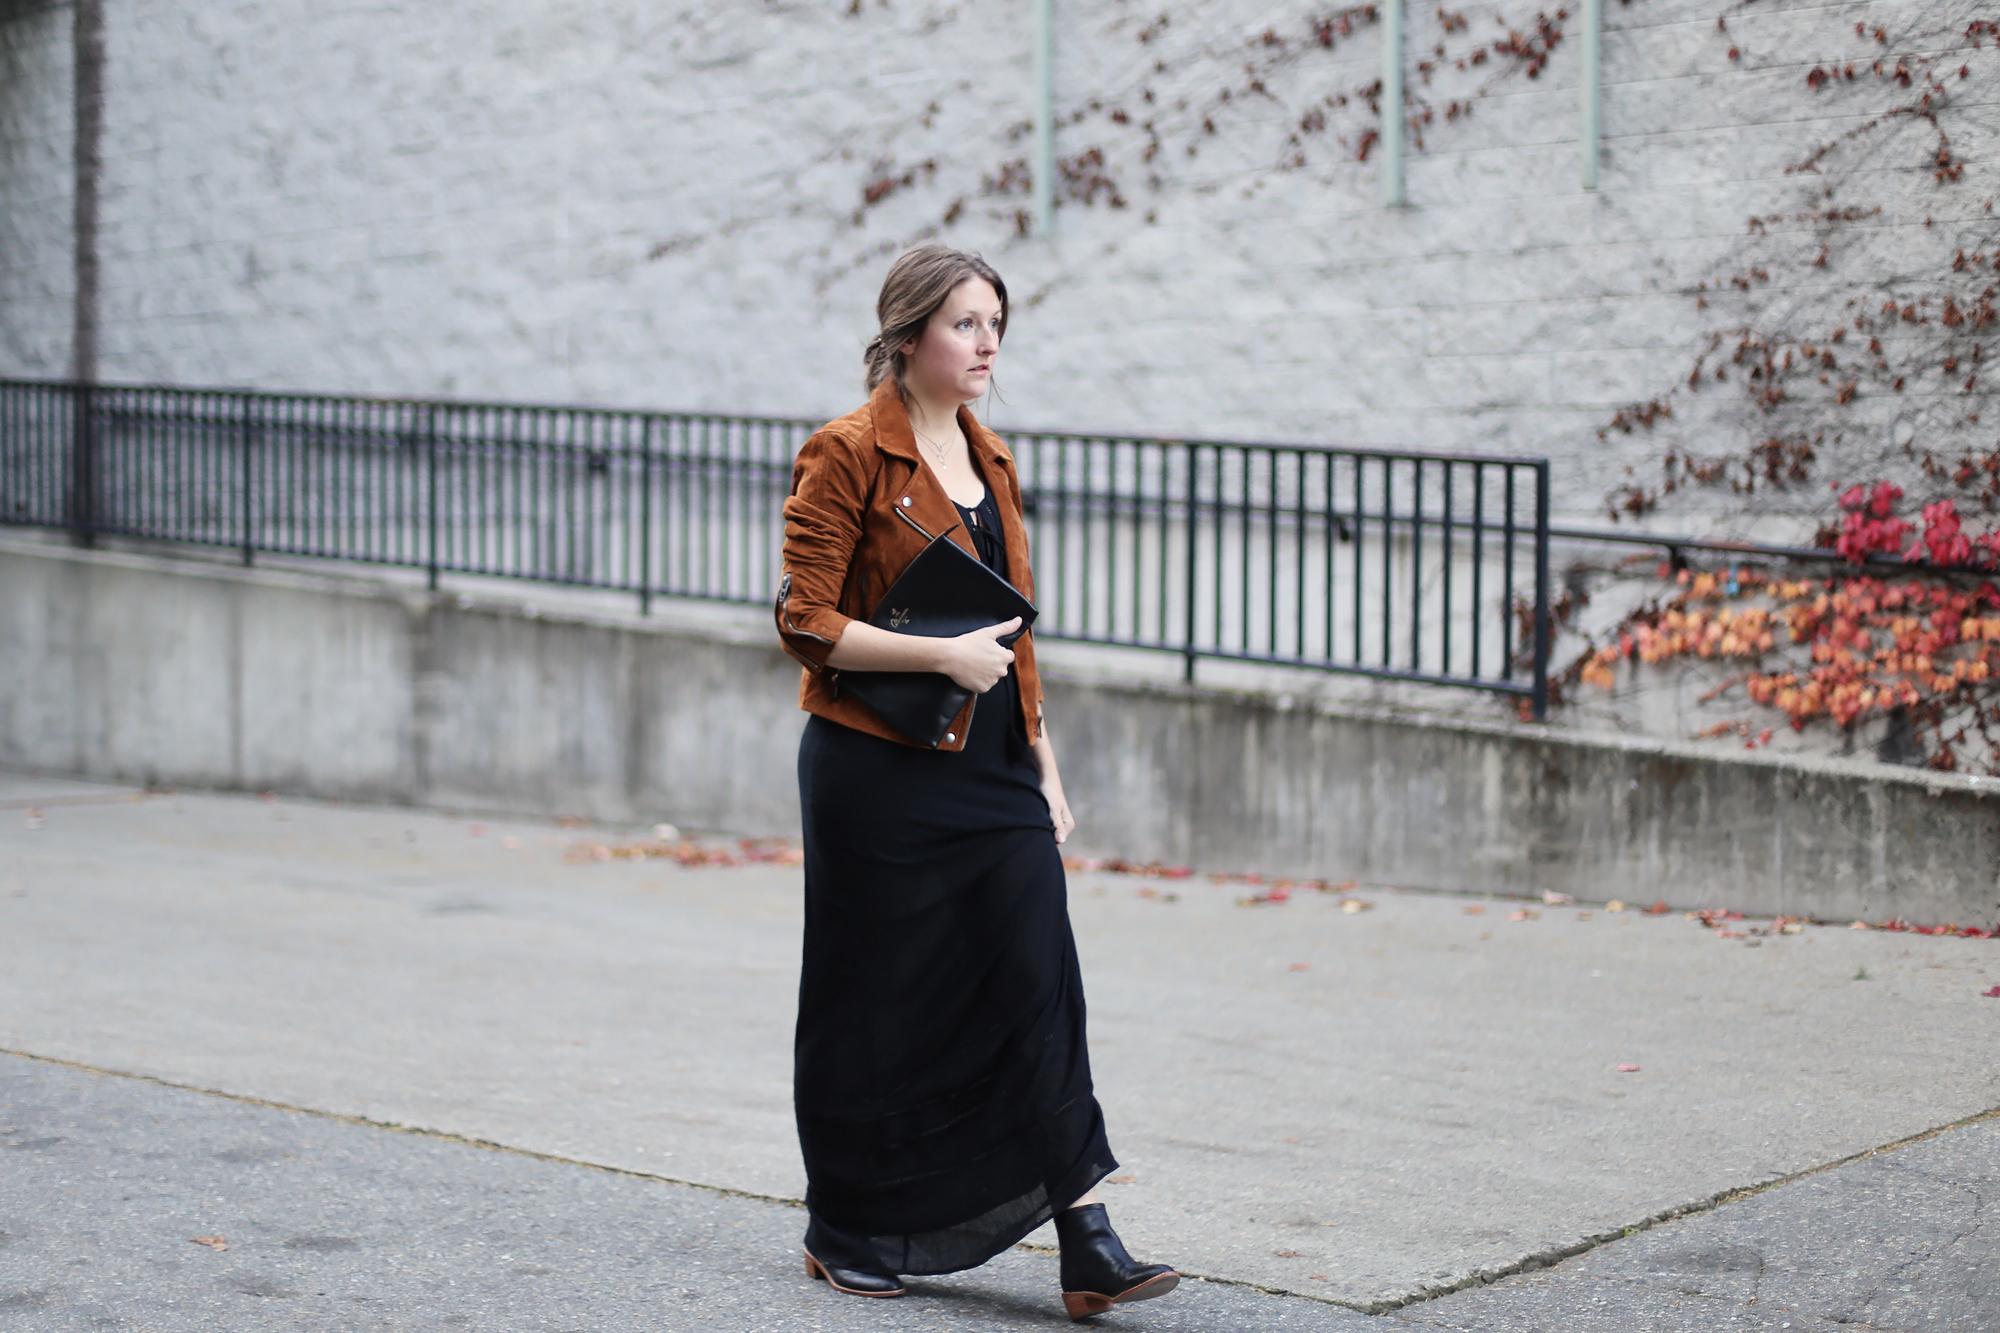 Minimalist street style: black maxi dress, brown suede moto jacket, black booties, and a black clutch. #ootd